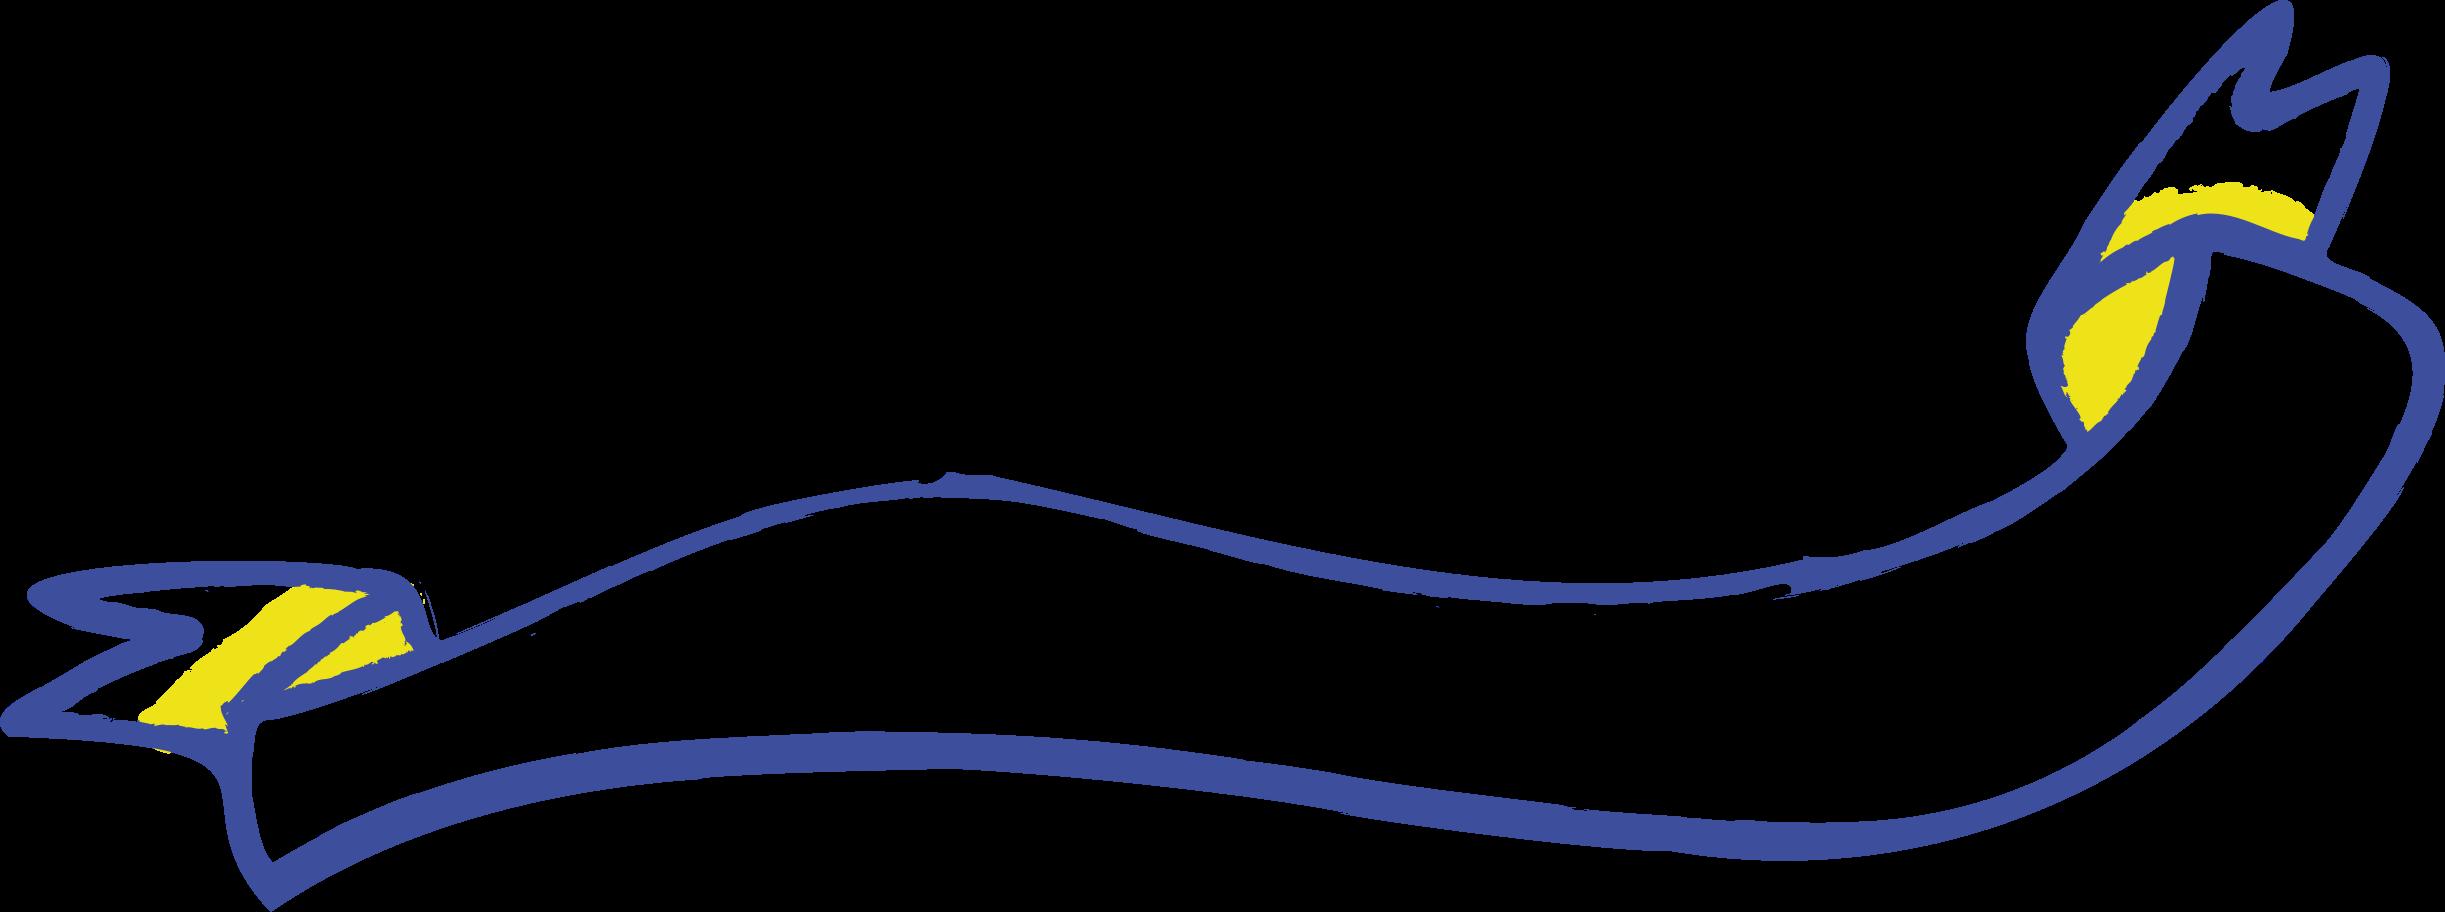 tape Clipart illustration in PNG, SVG